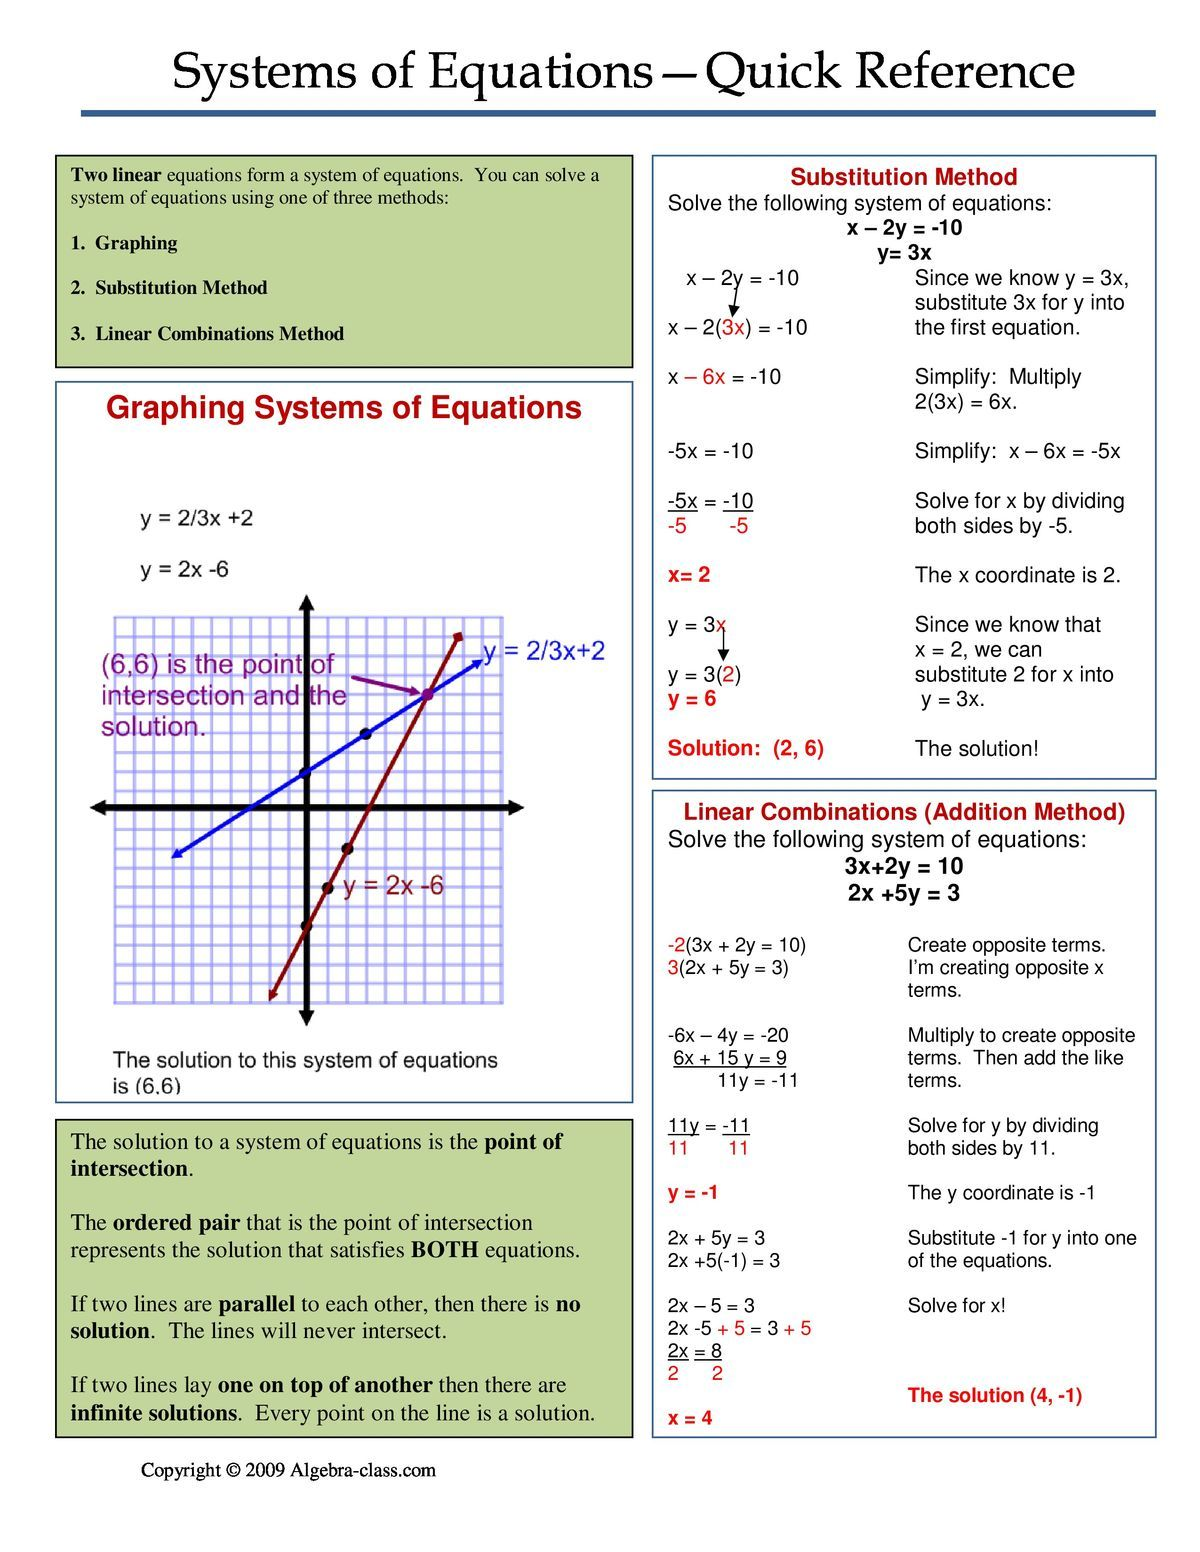 32b4e00789d2e09dc1d118adbb8a796c Jpg 1 200 1 552 Pixels Systems Of Equations Equations Teaching Algebra